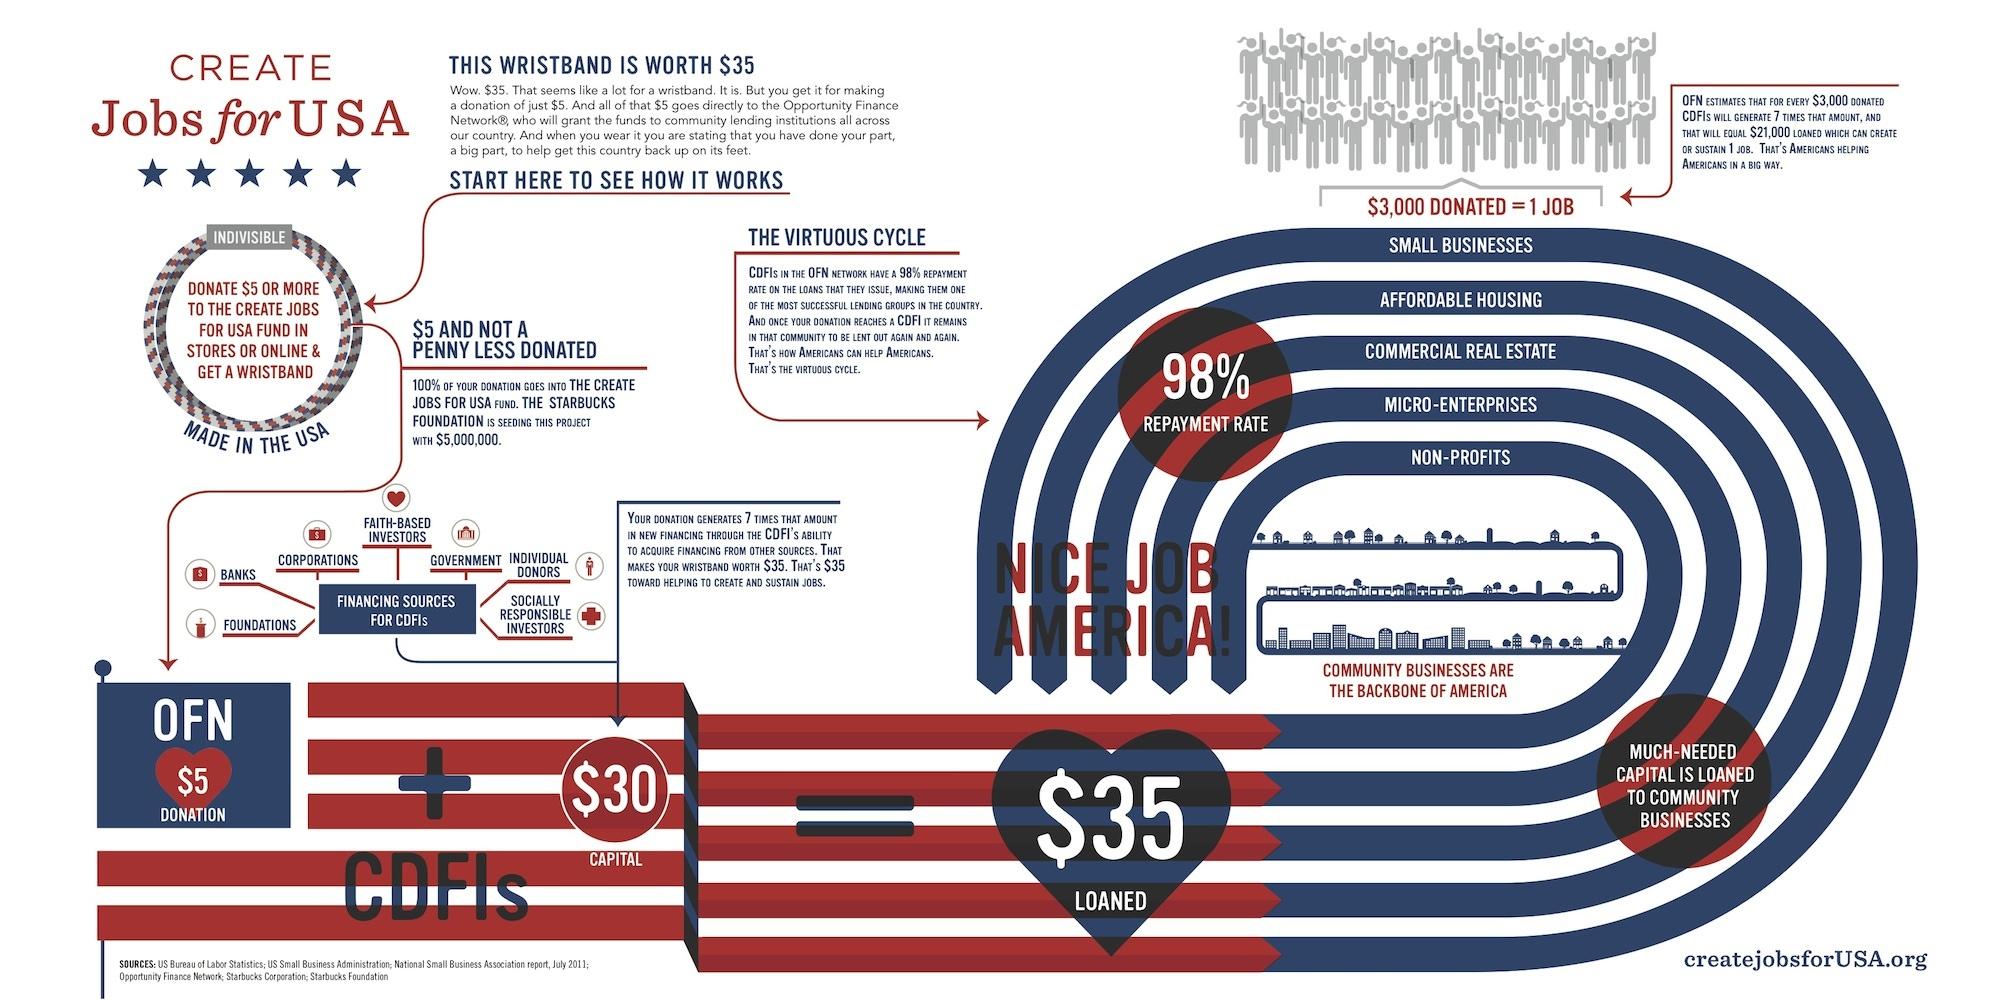 Create-Jobs_Infographic_GOOD-Corps_big_o